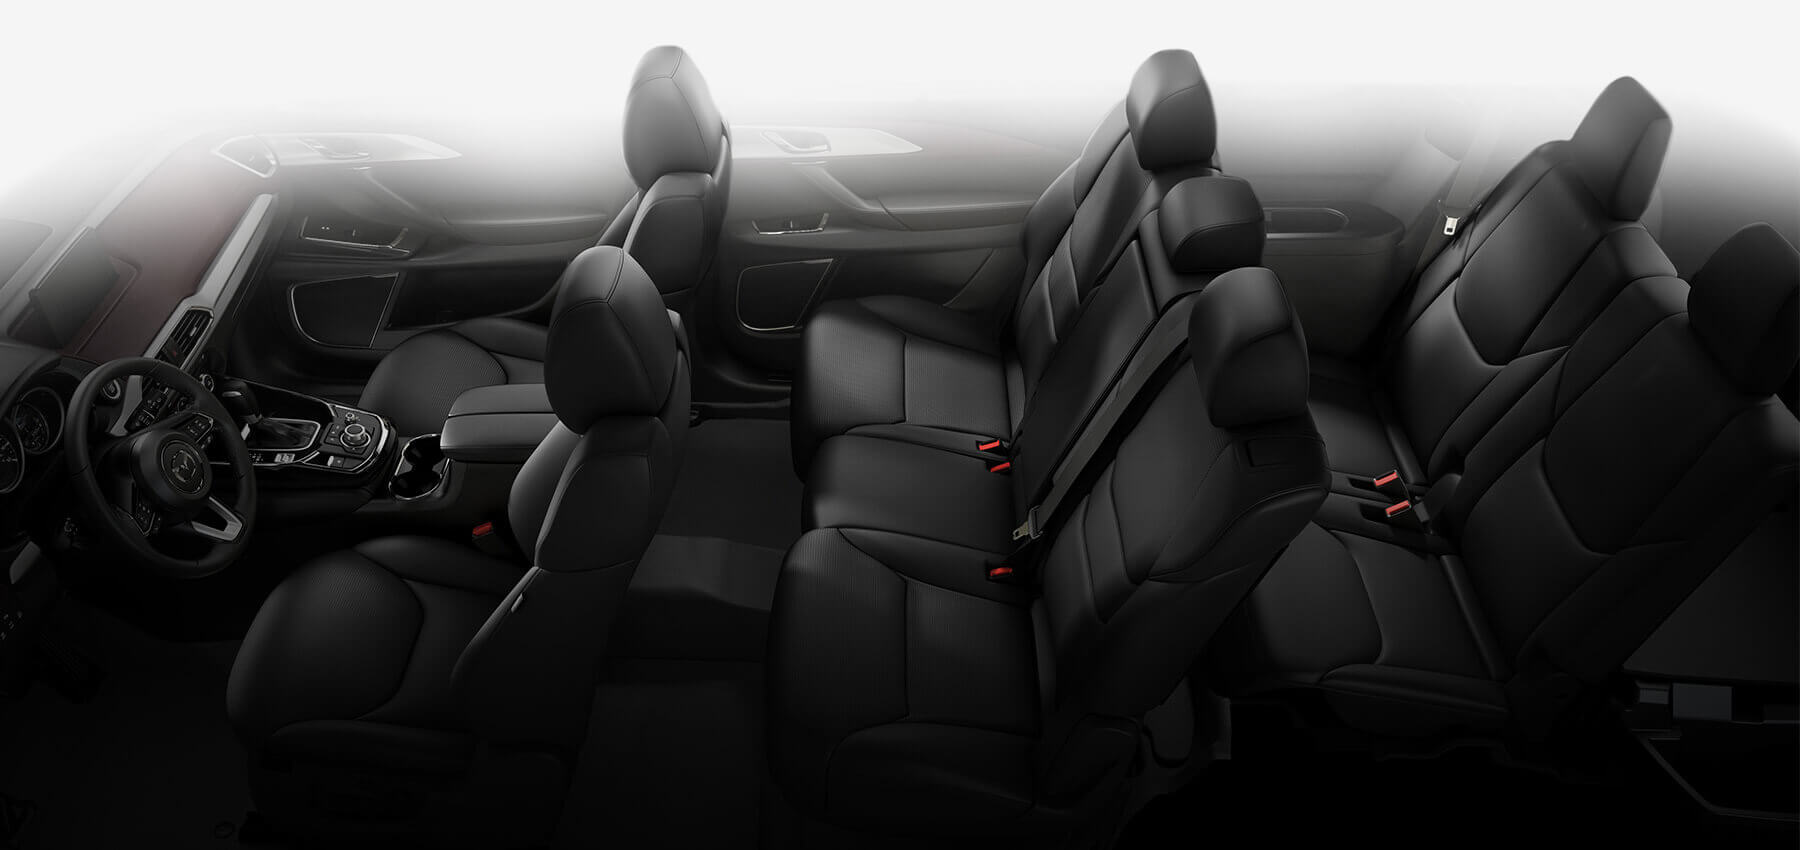 2017 mazda cx 9 3 row 7 passenger suv mazda usa. Black Bedroom Furniture Sets. Home Design Ideas